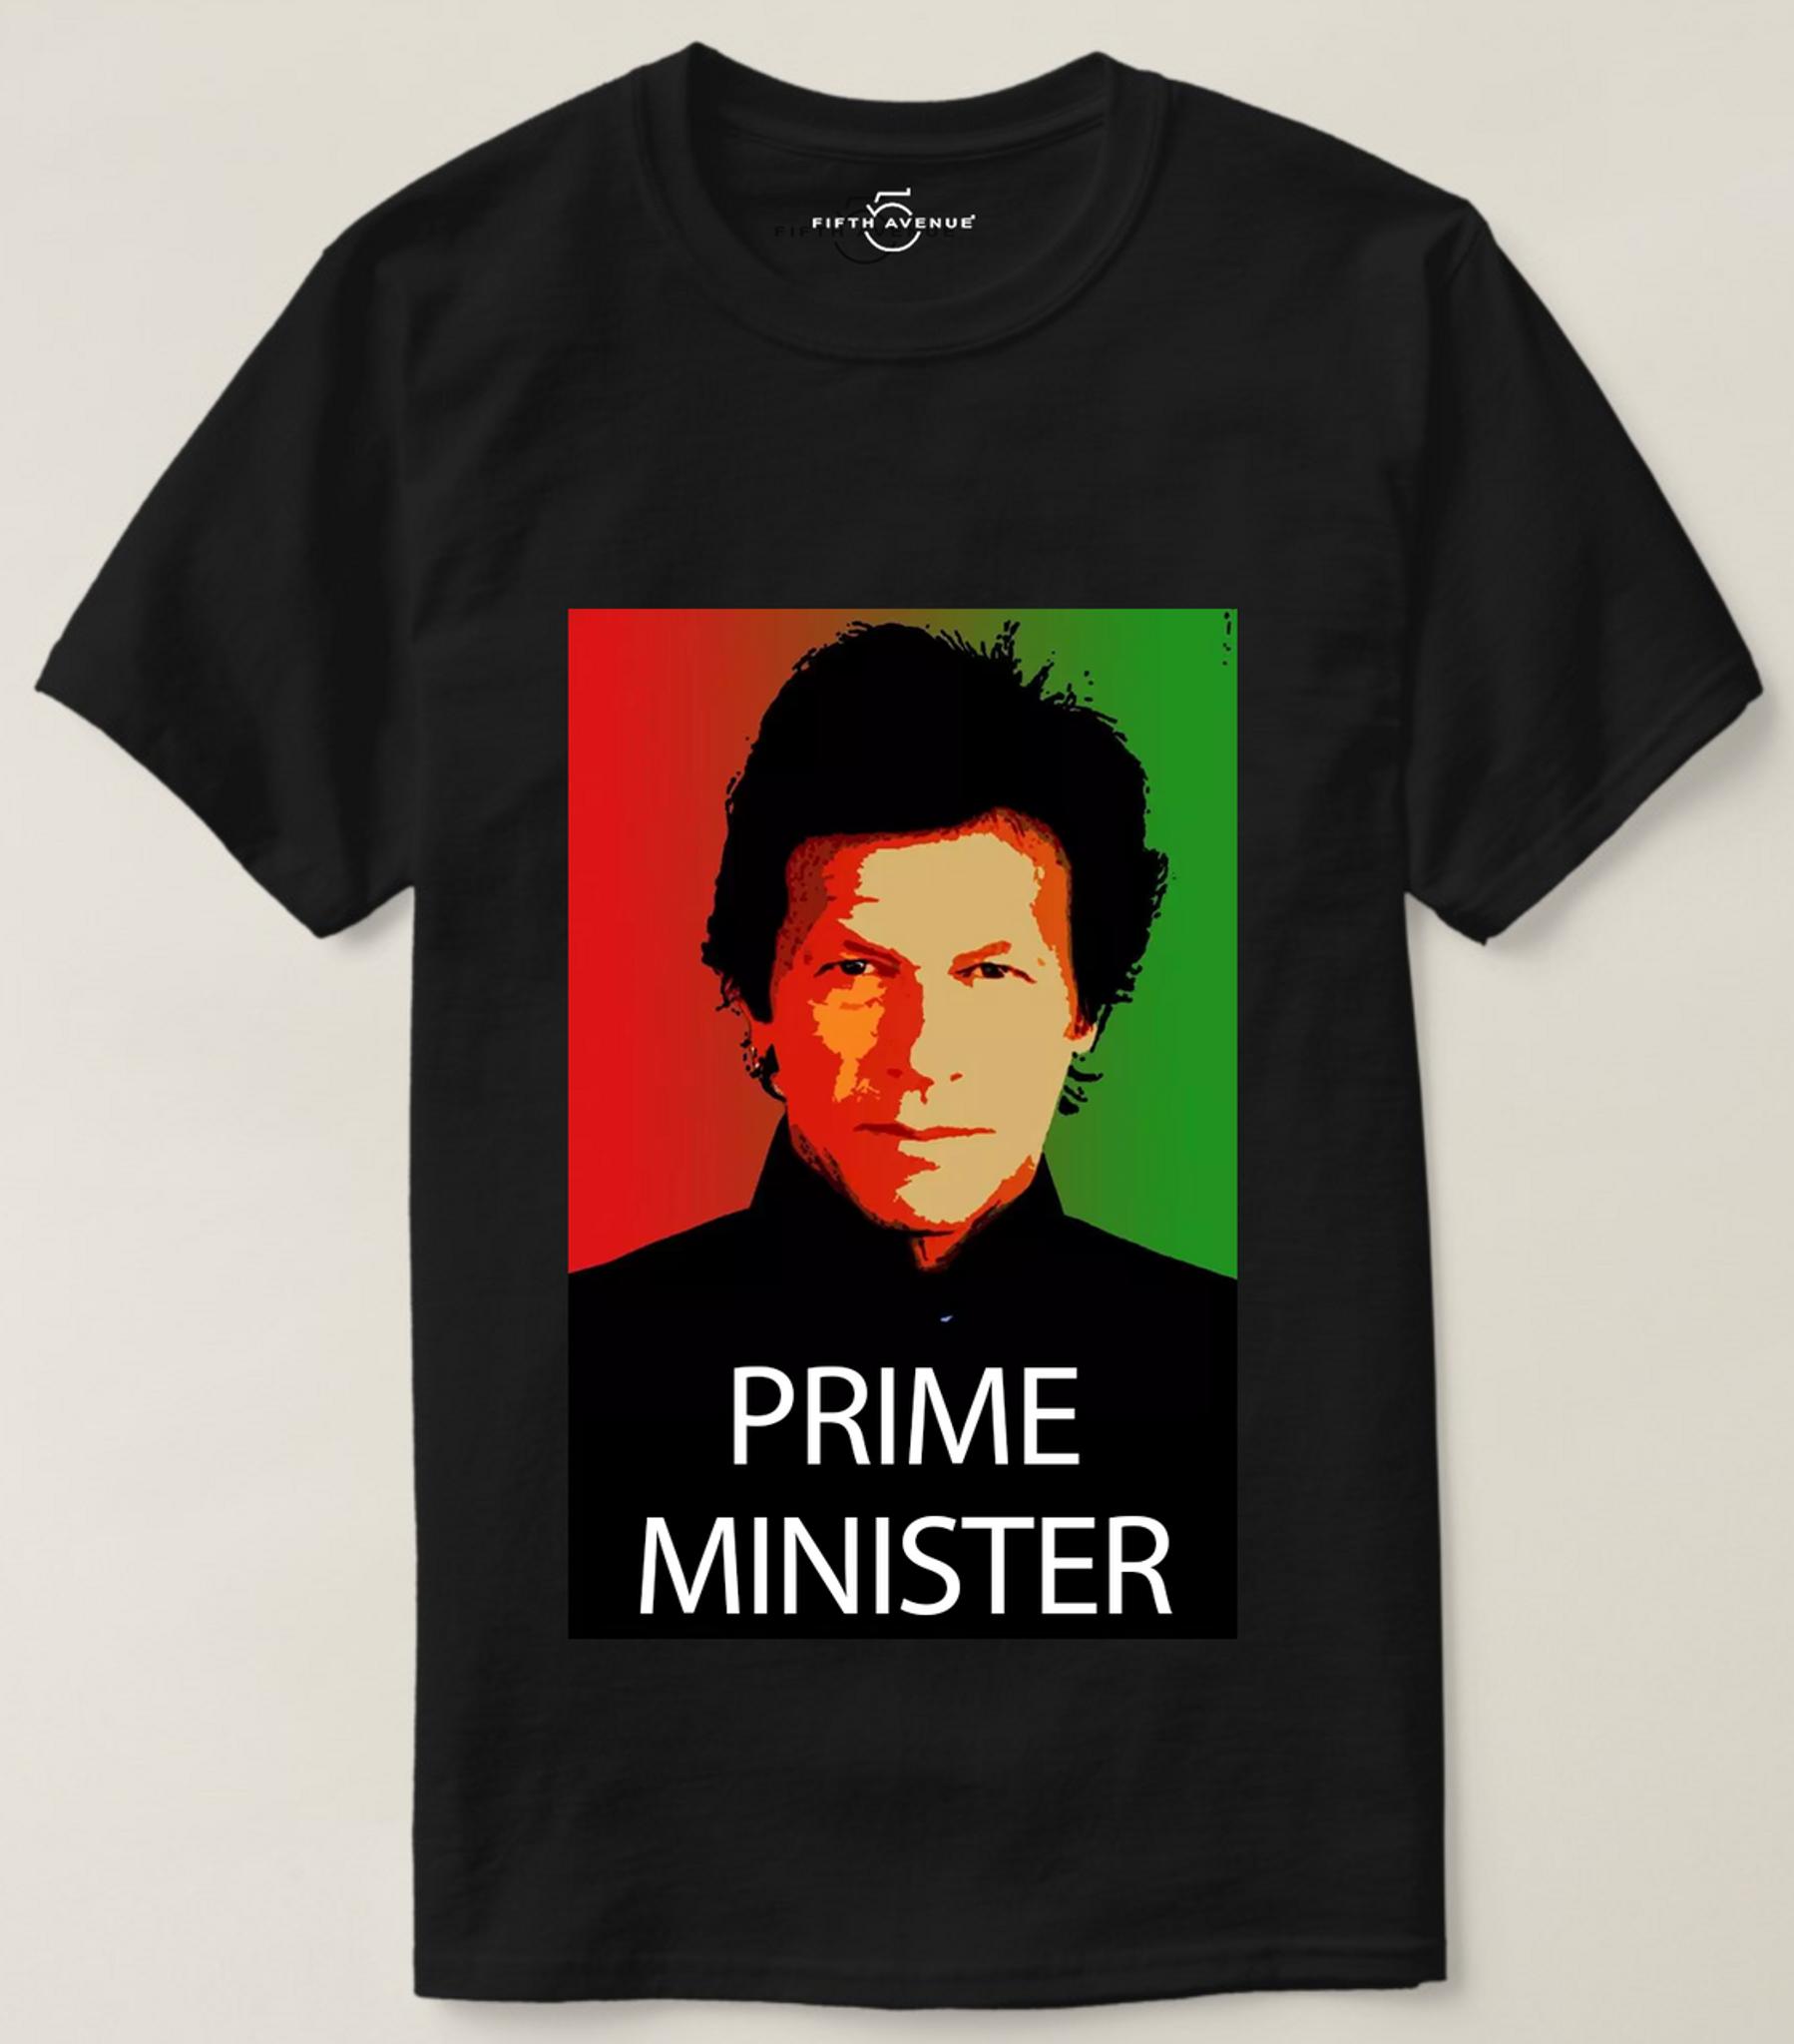 Fifth Avenue My Prime Minister Khan Vector 3 Print T-Shirt - Black